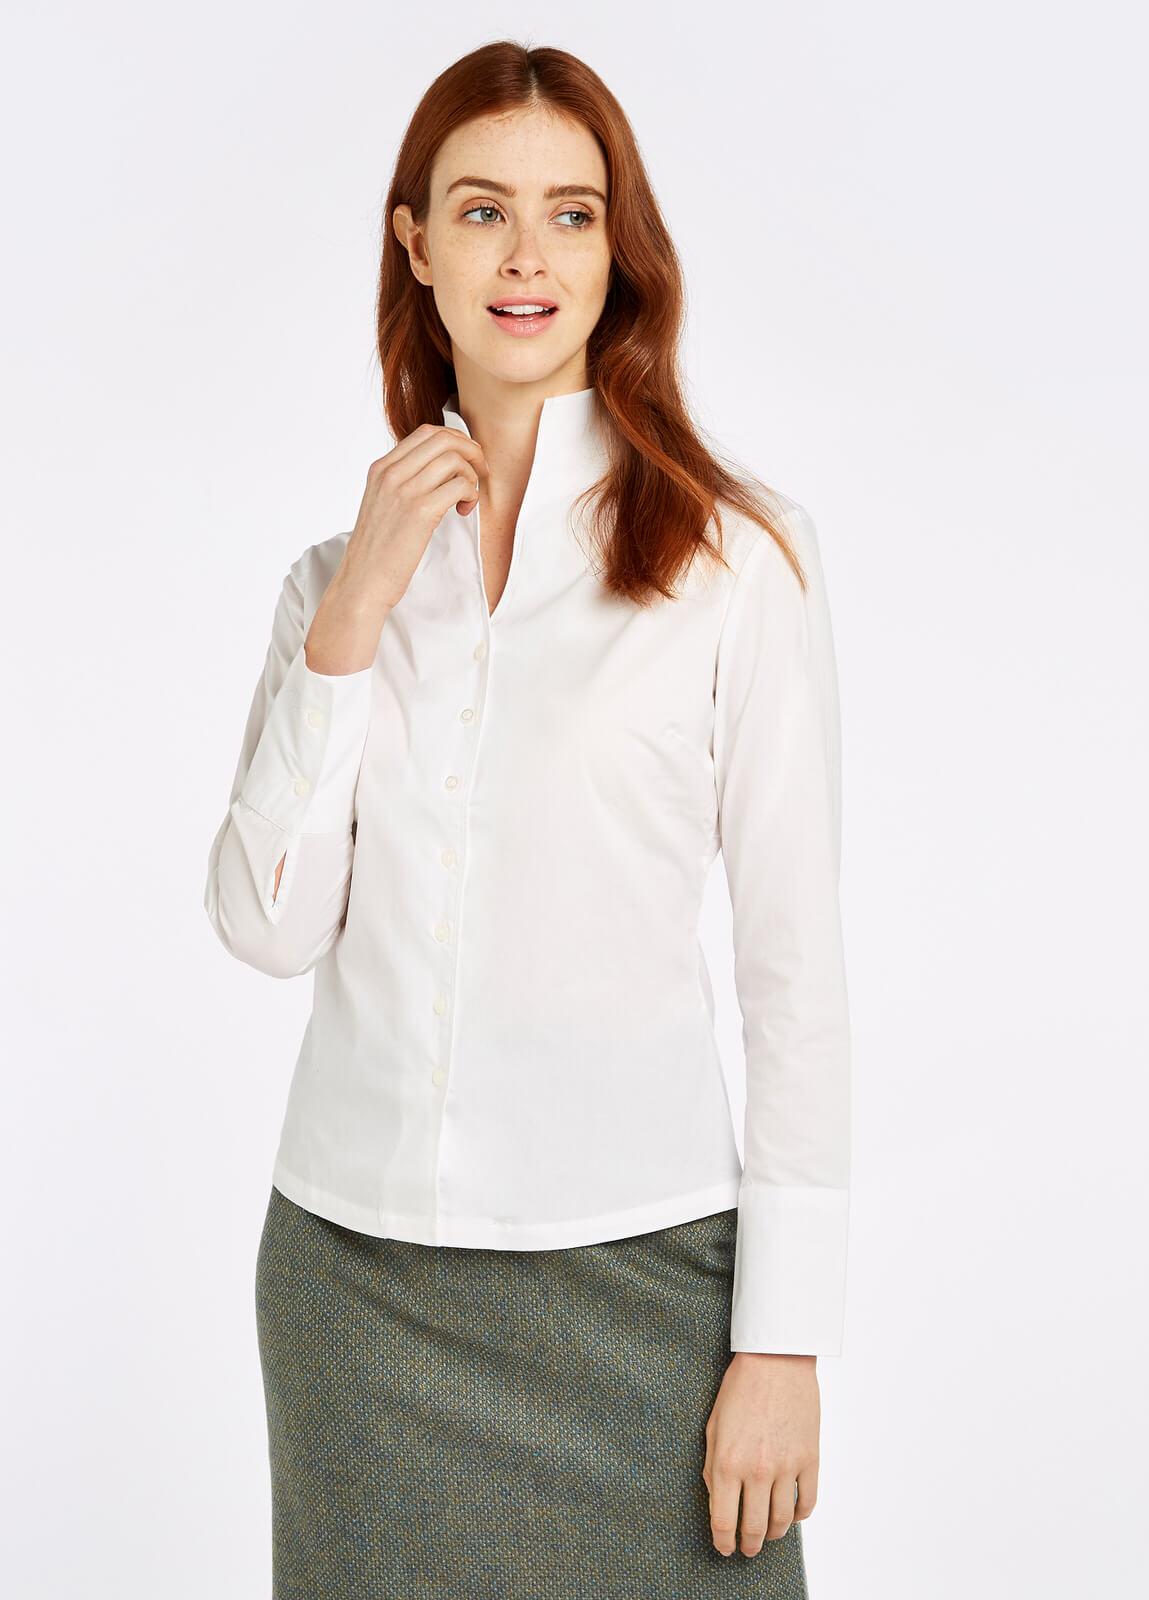 Snowdrop_Shirt_White_on_model